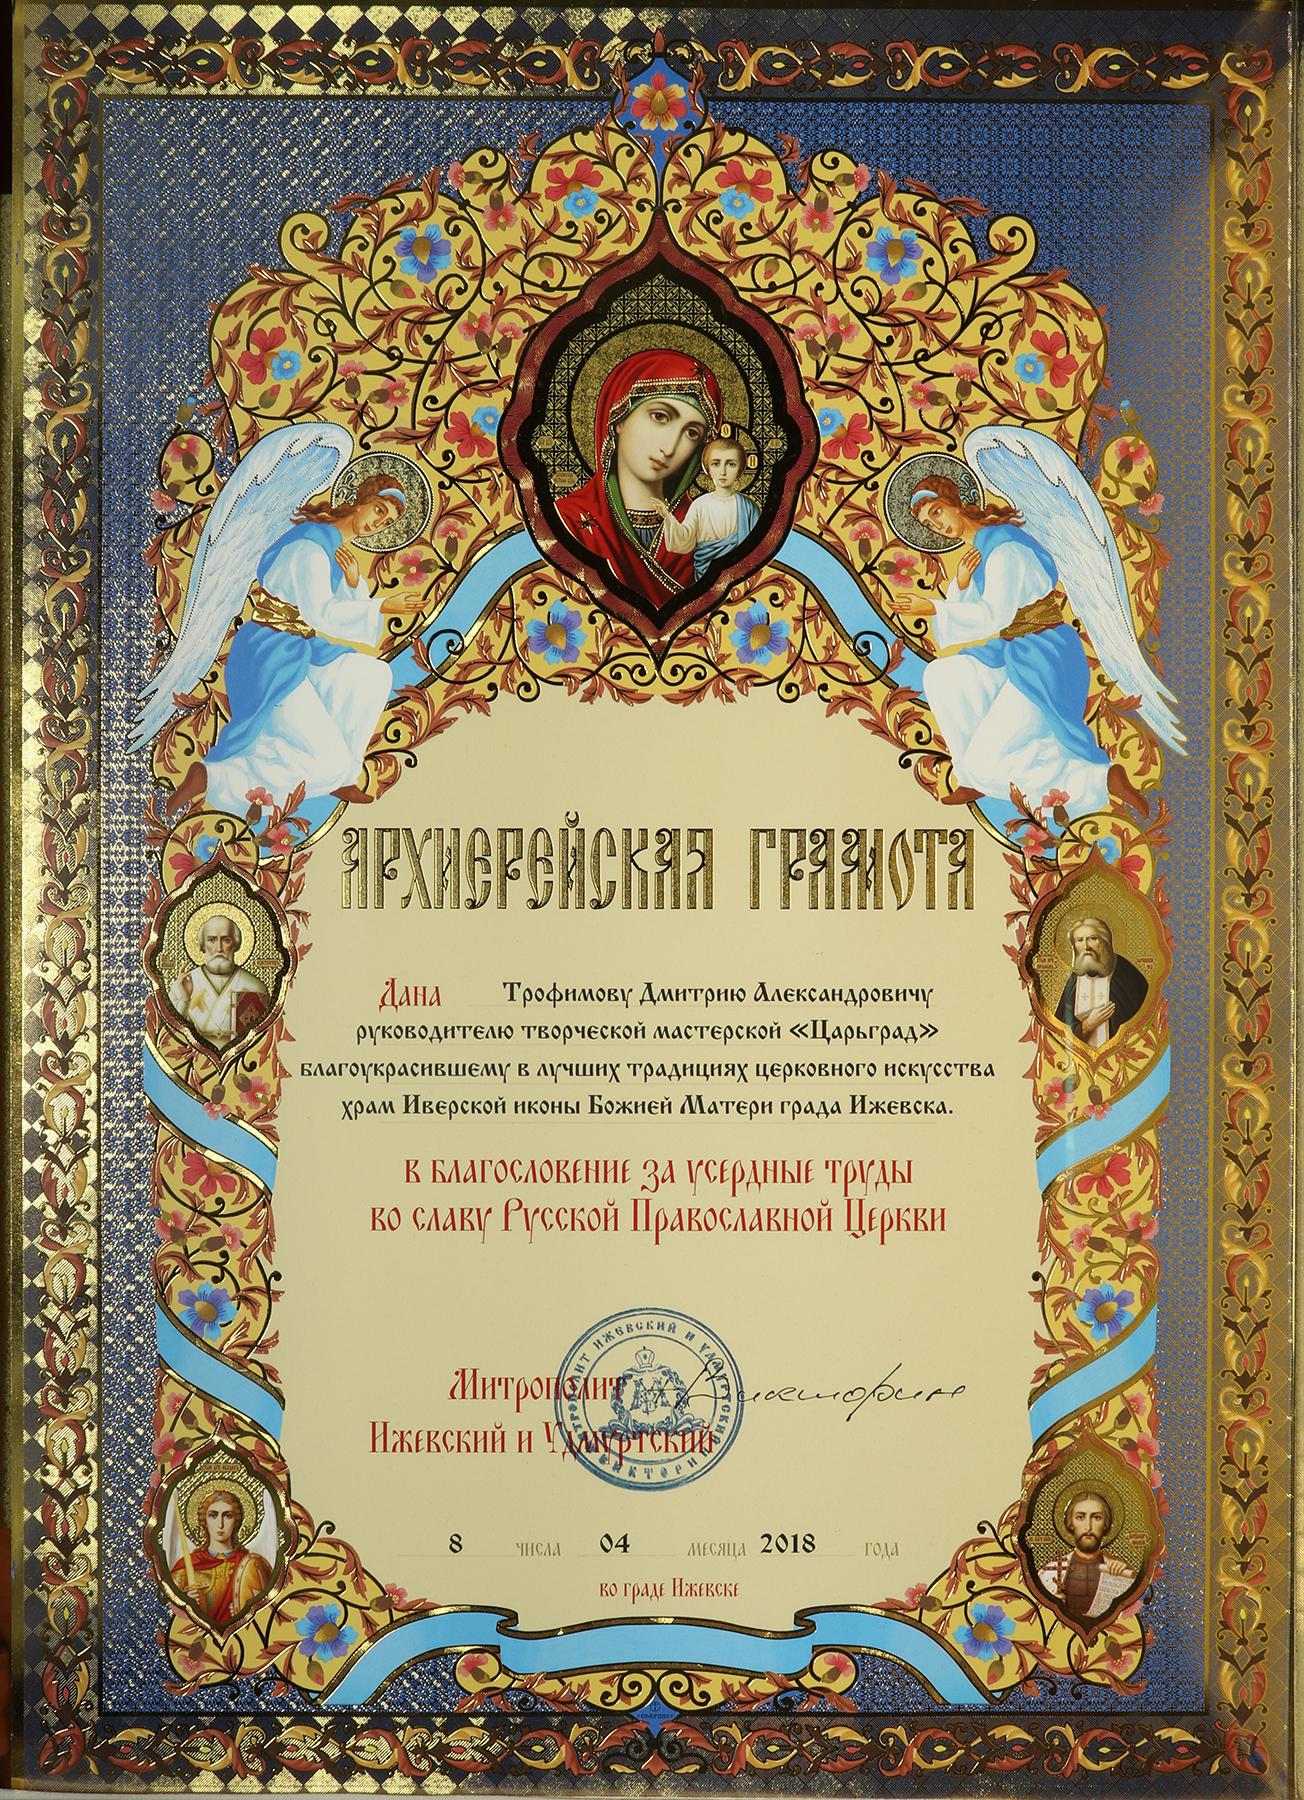 Грамота от митрополита Ижевского и Удмуртского